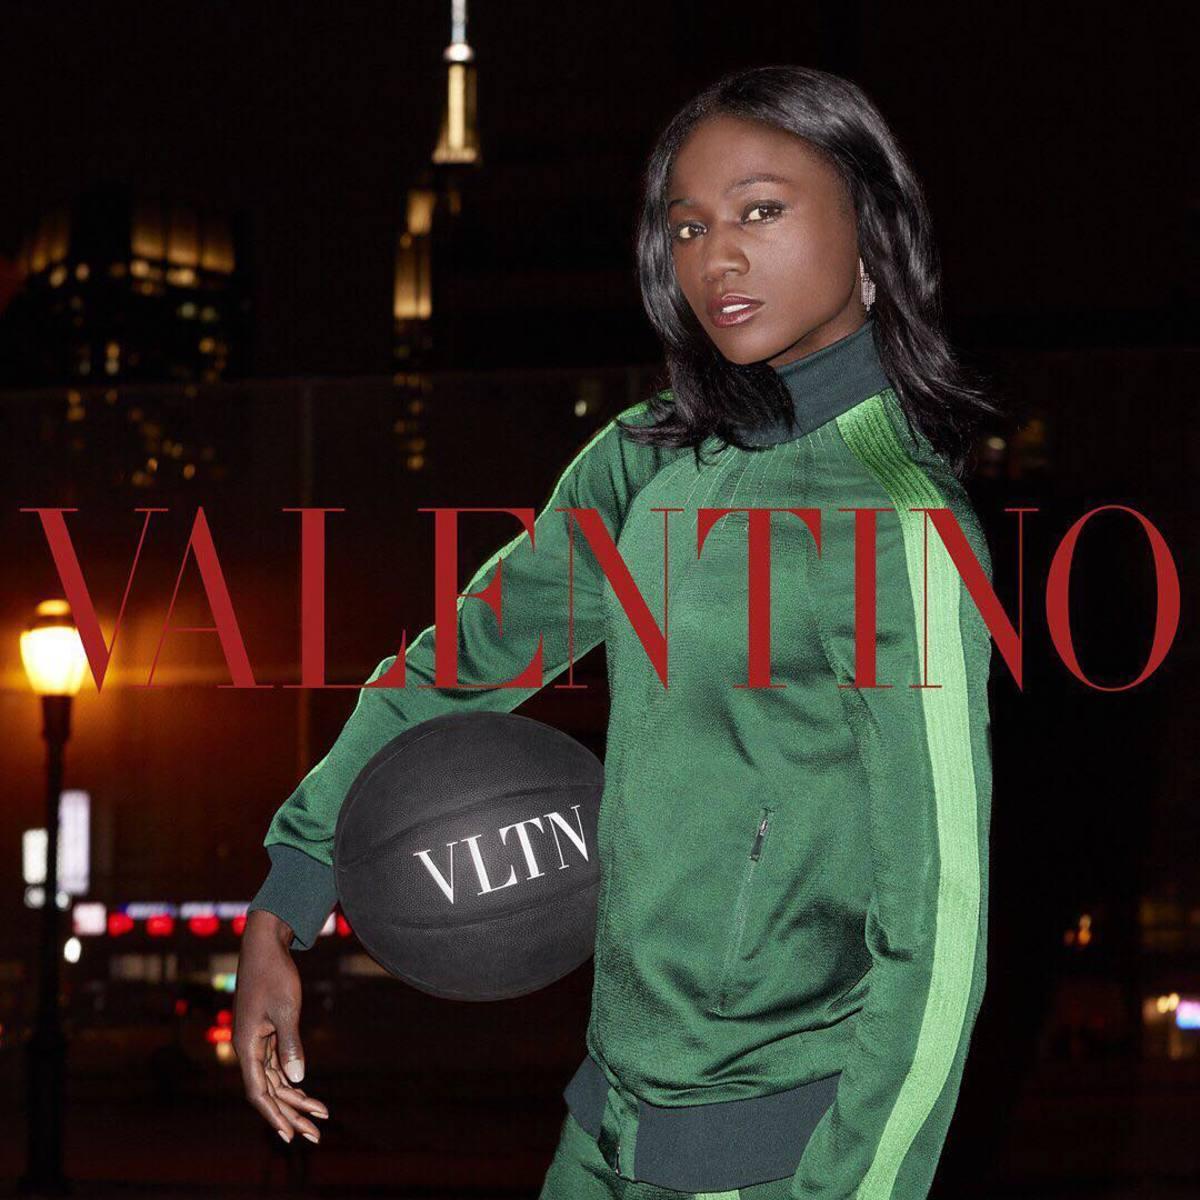 Valentino's Resort 2018 campaign shot by Terry Richardson. Photo: @maisonvalentino/Instagram